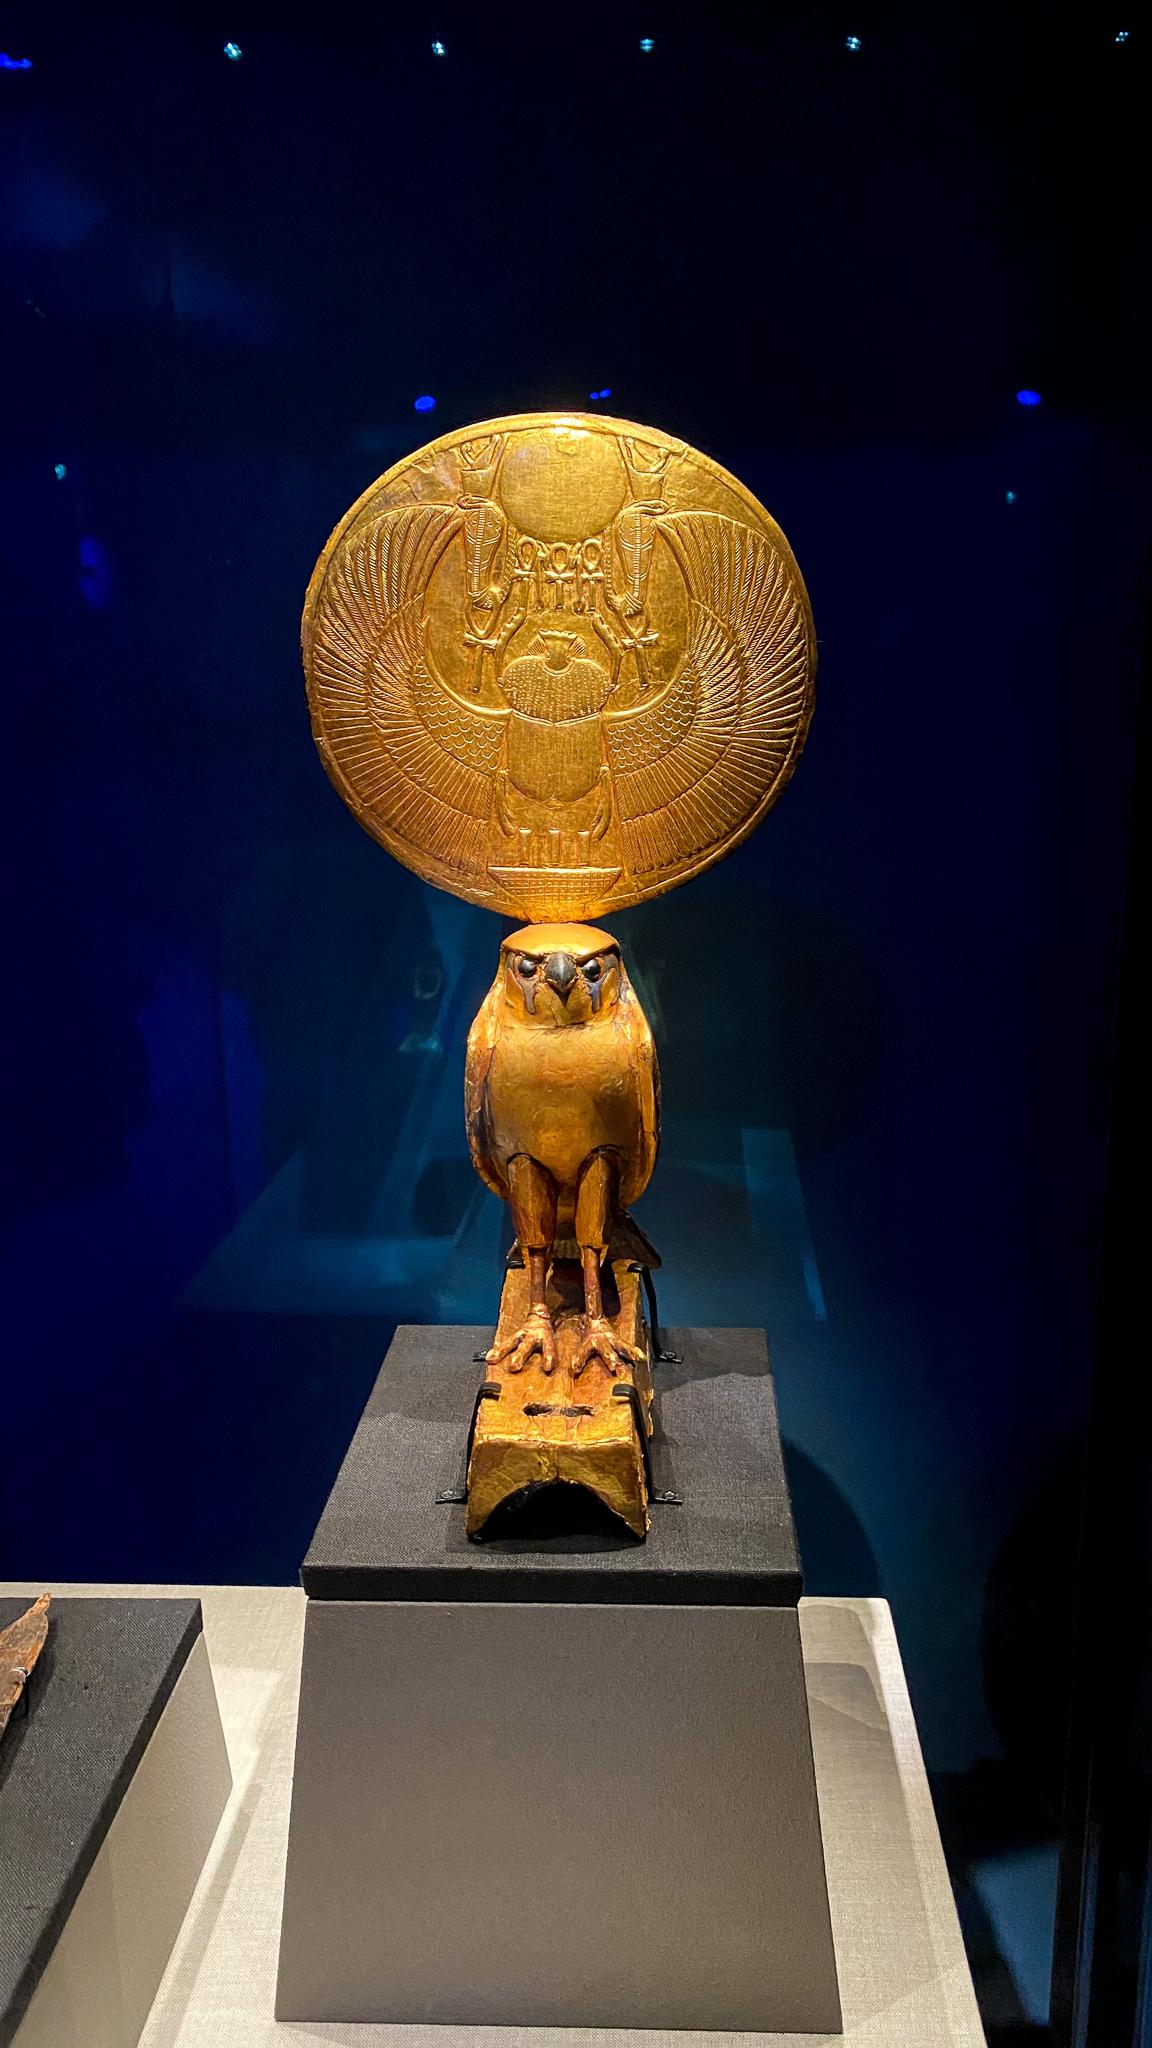 Tutankhamun London Exhibition - Things To Do West London | The LDN Diaries